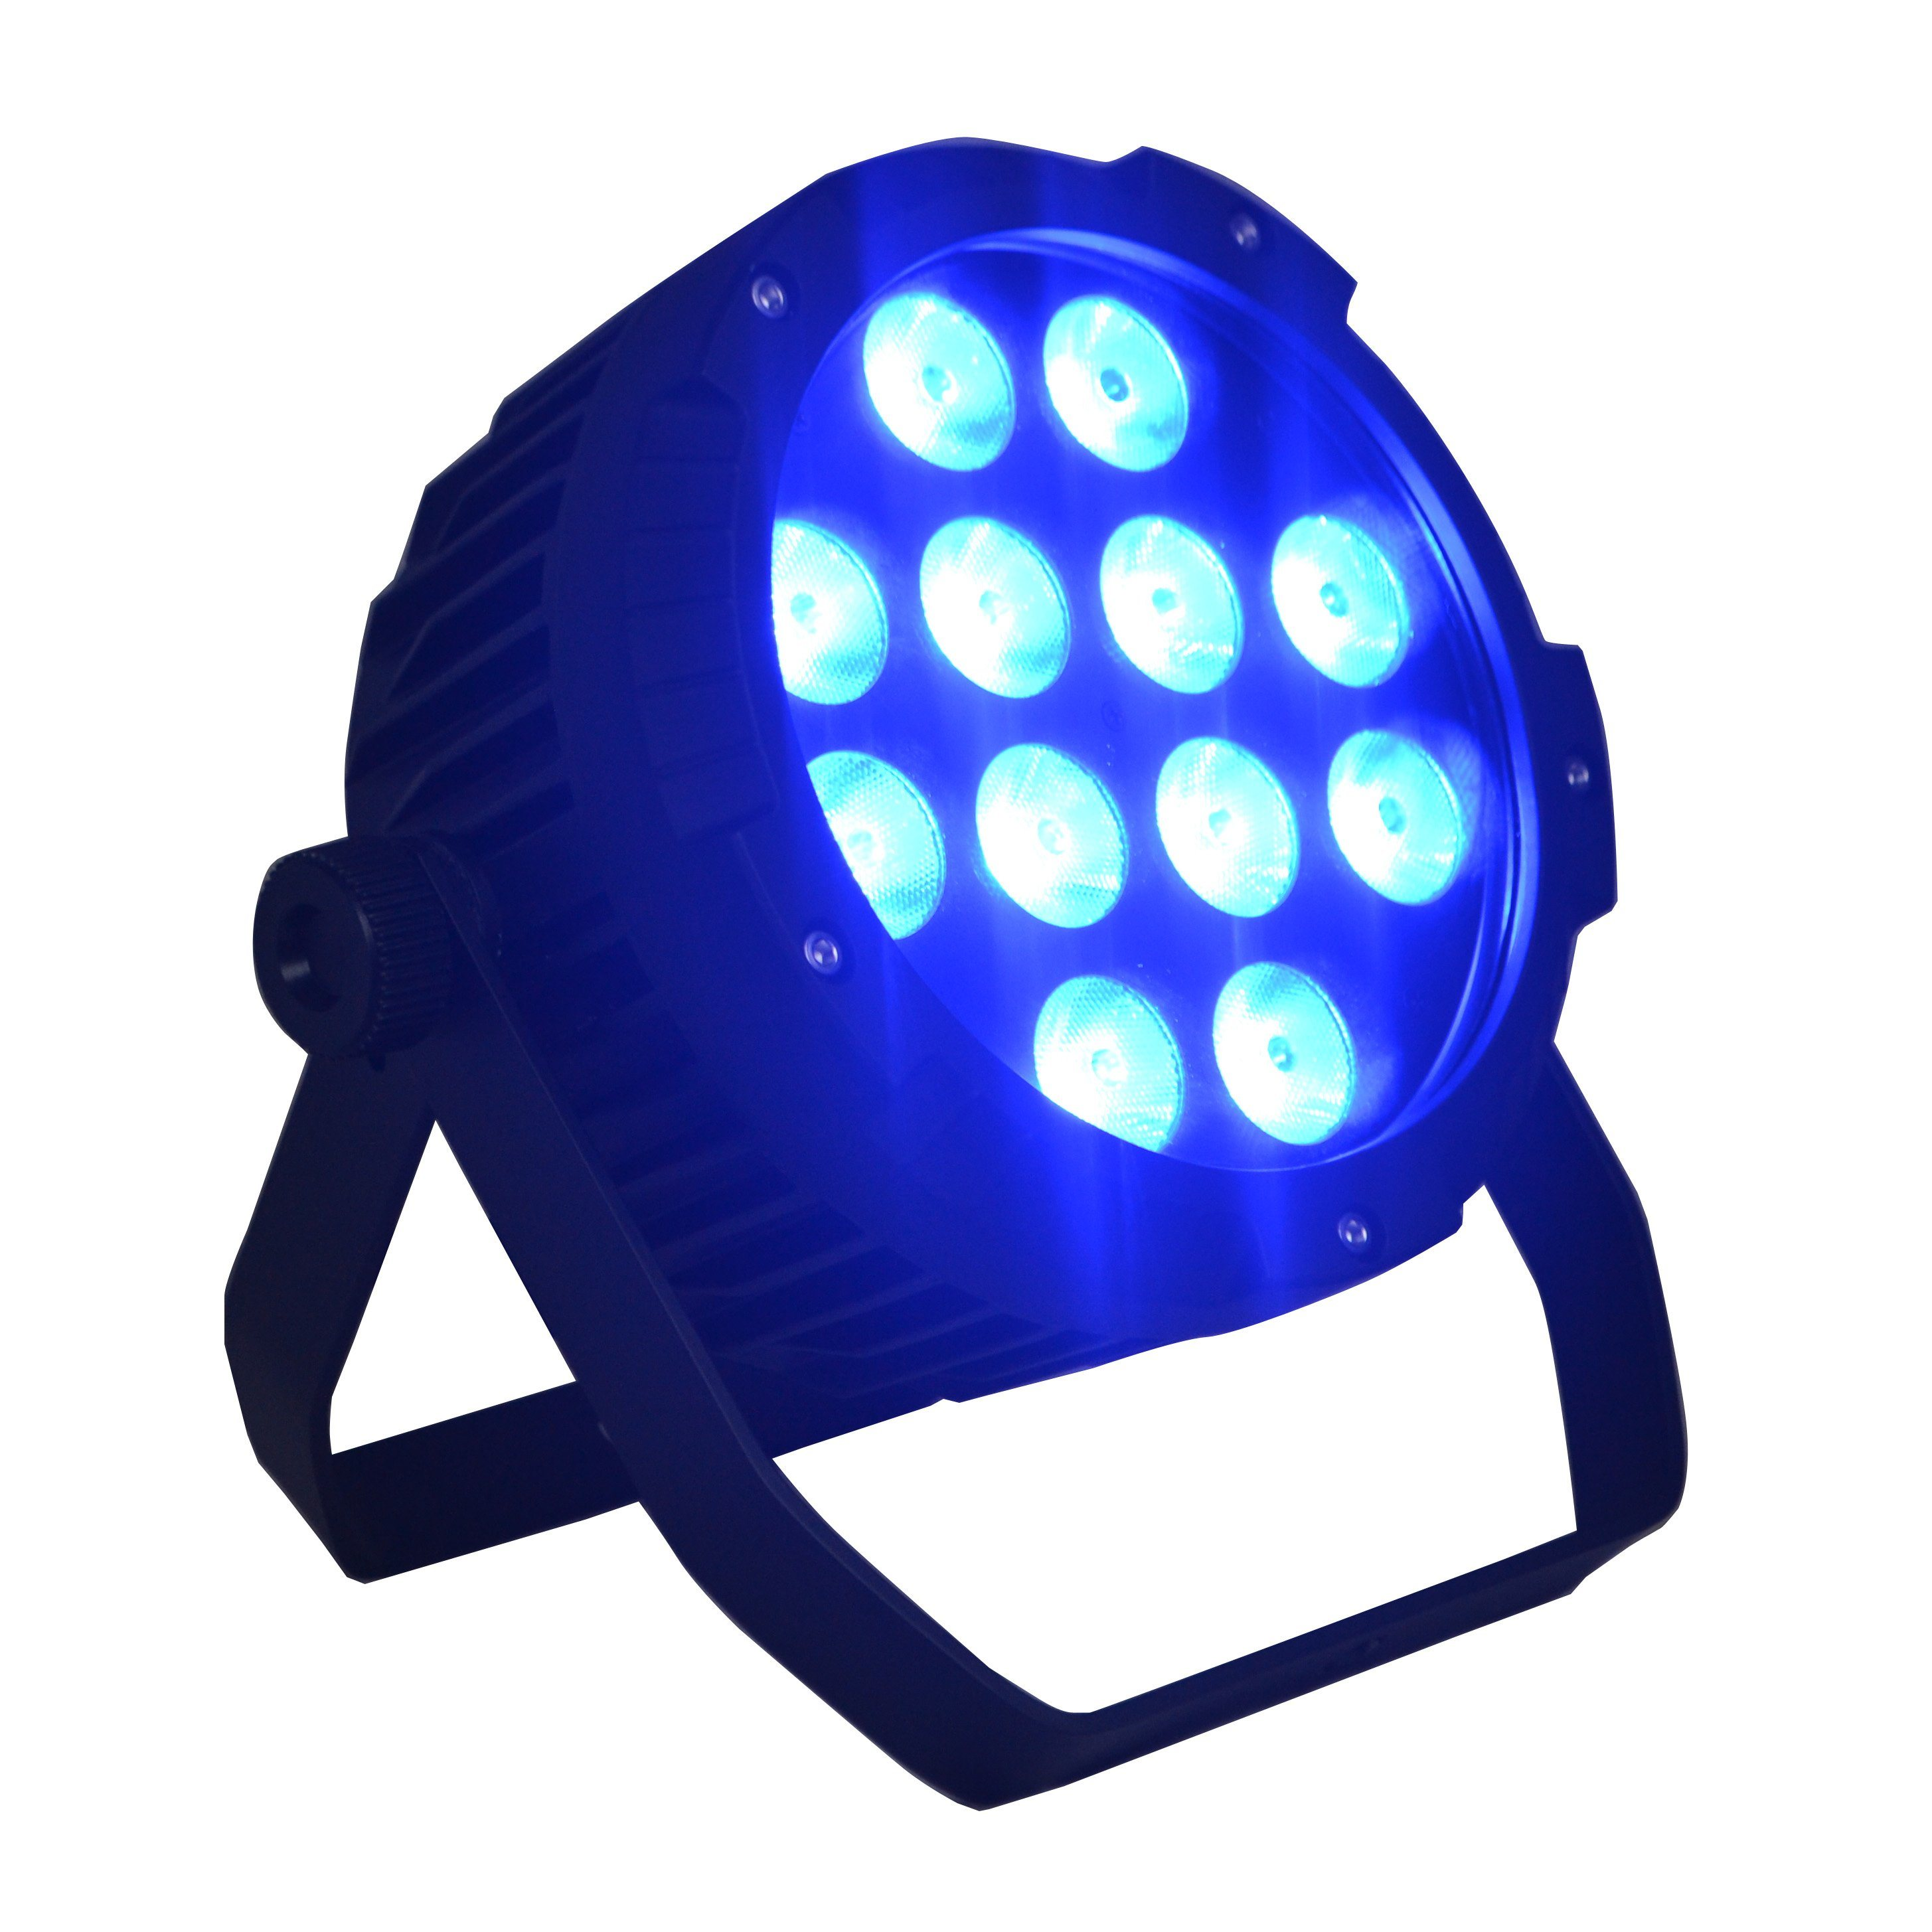 Neutrik Powercon True1 Connector LED PAR Light for Stage Lighting